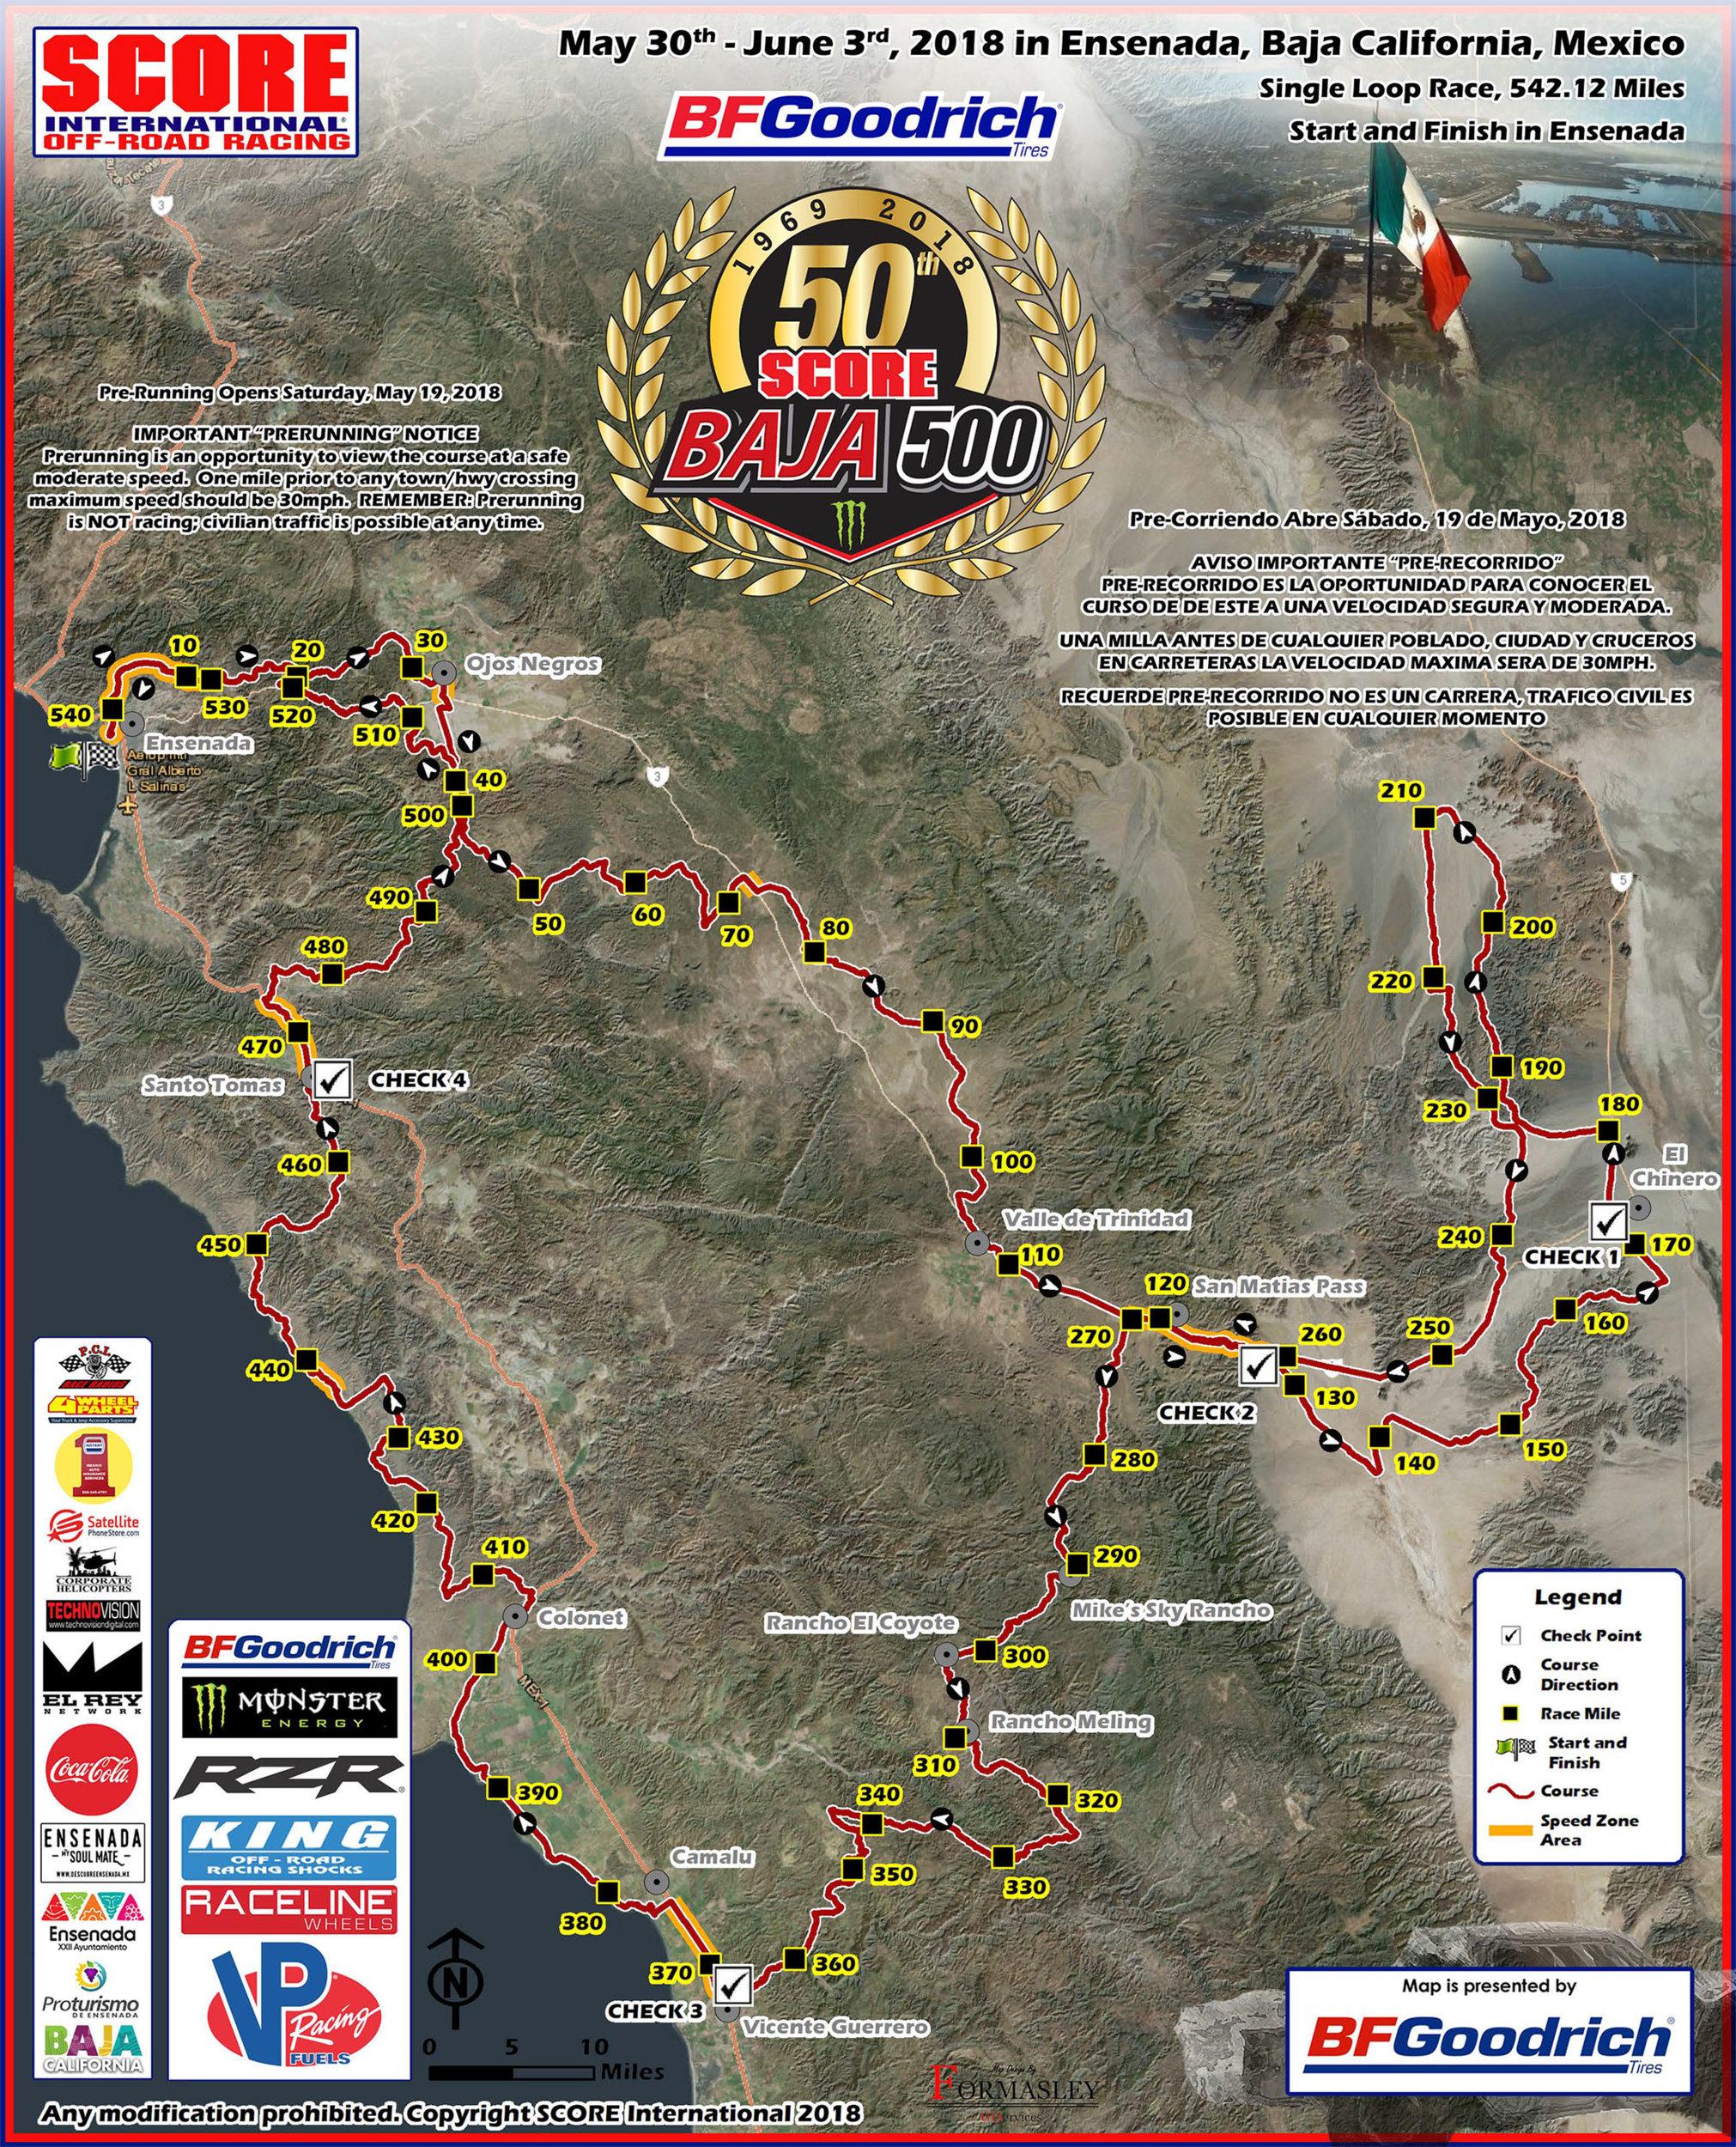 2018-SCORE-Baja-500-map_v3.jpg